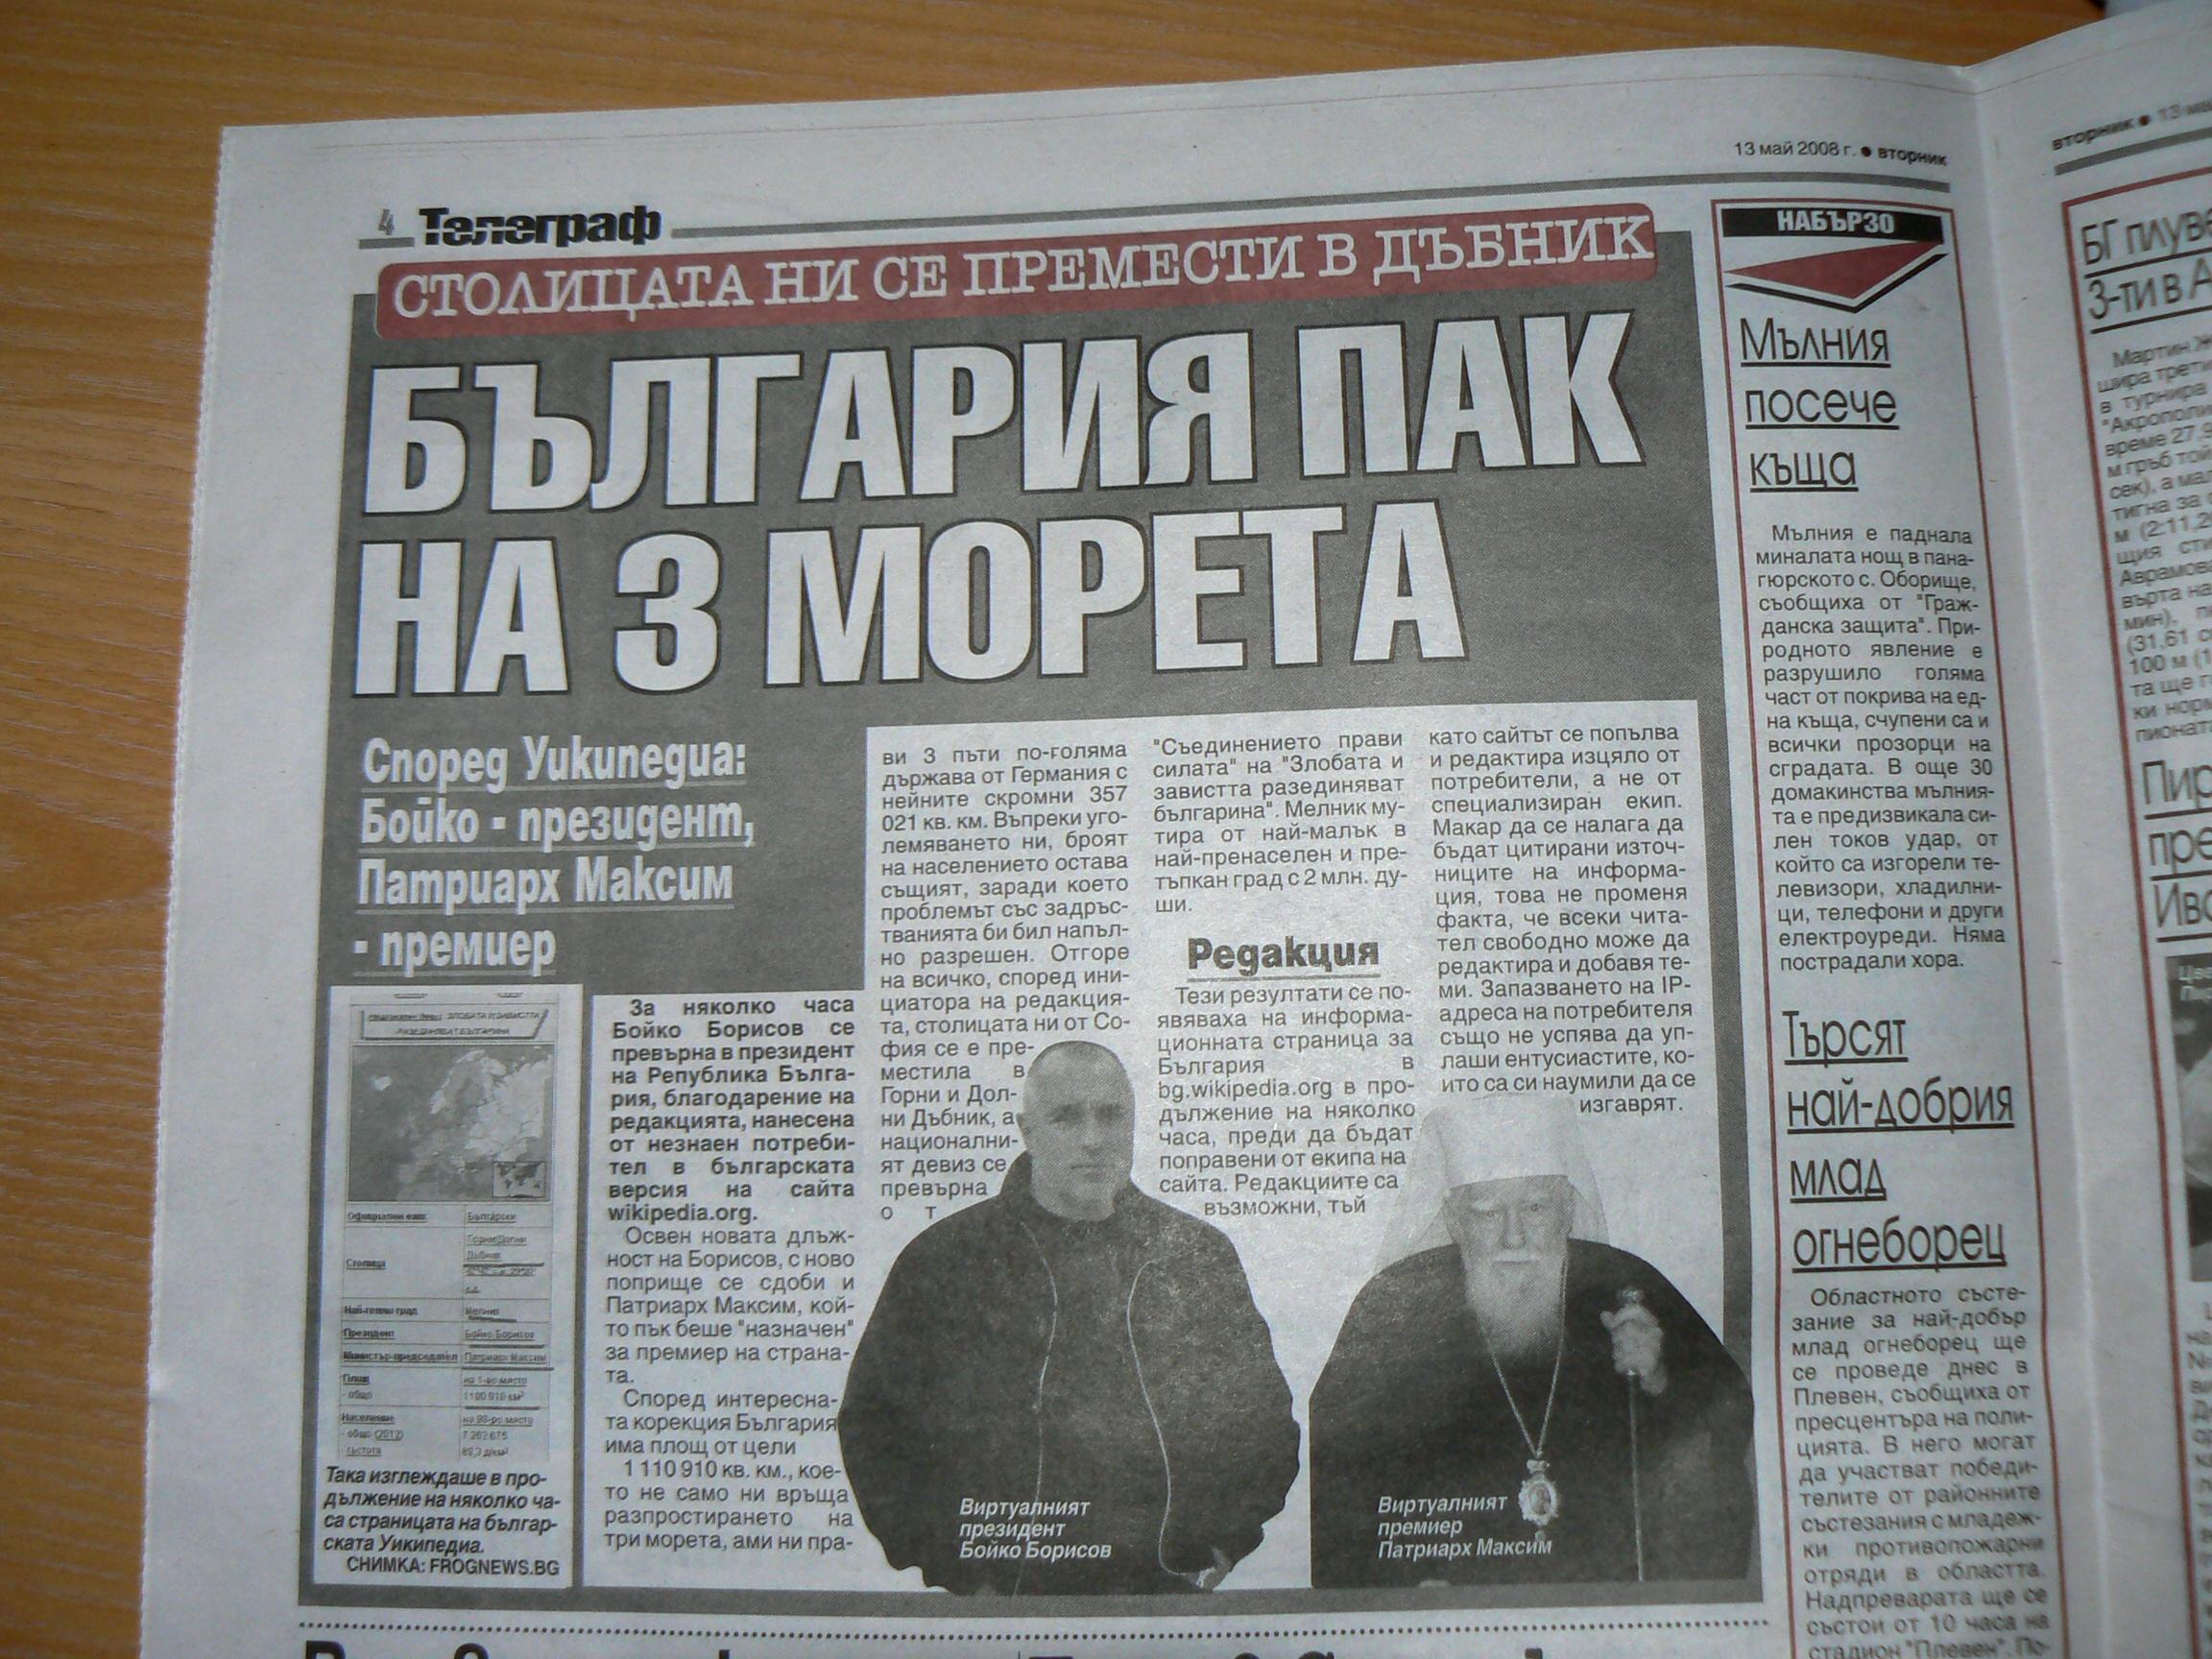 telegraf-13-may-2008.JPG telegraf-13-may-2008.JPG